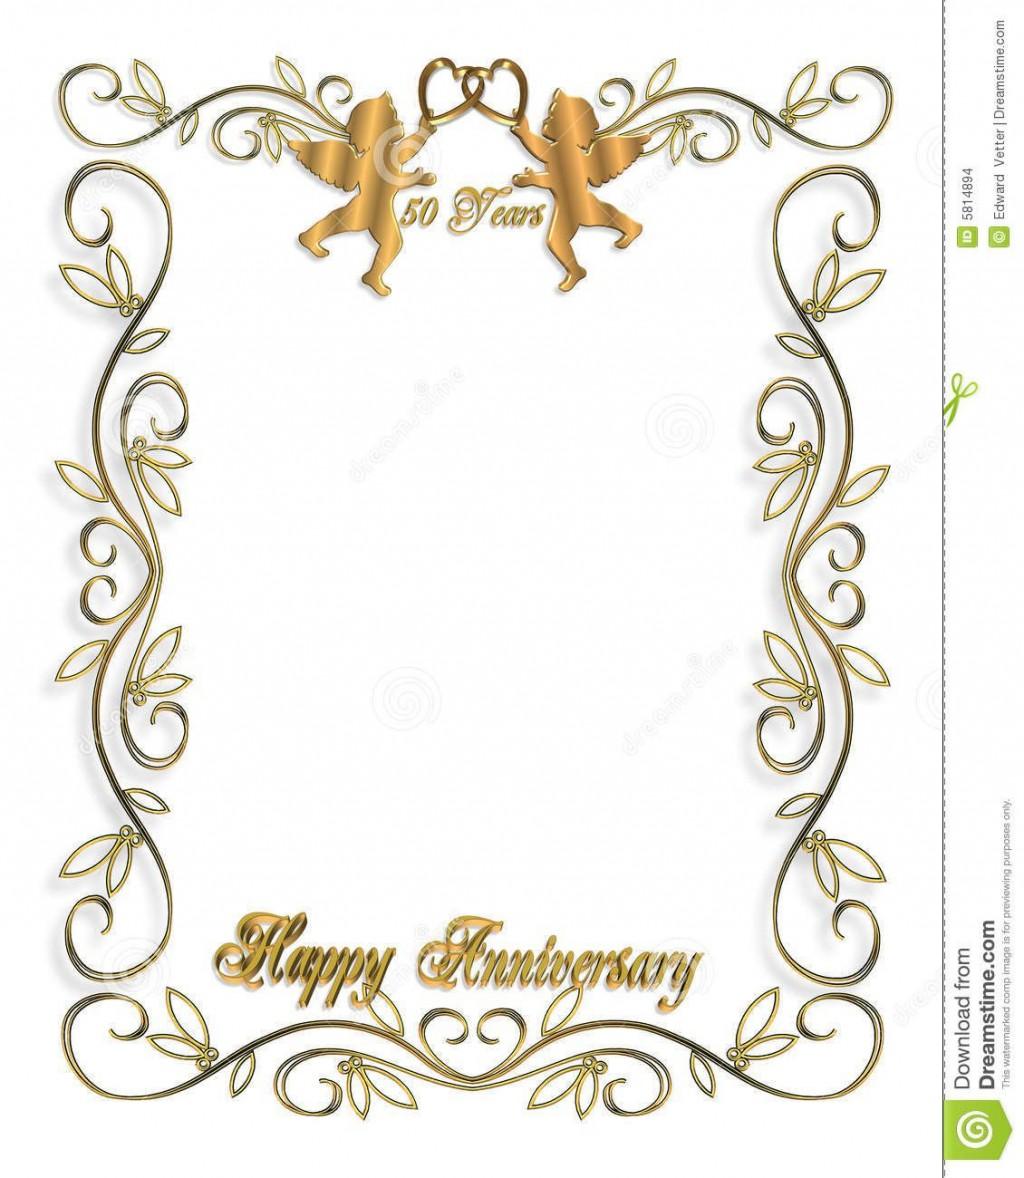 010 Striking 50th Anniversary Invitation Template Free Design  Download Golden WeddingLarge